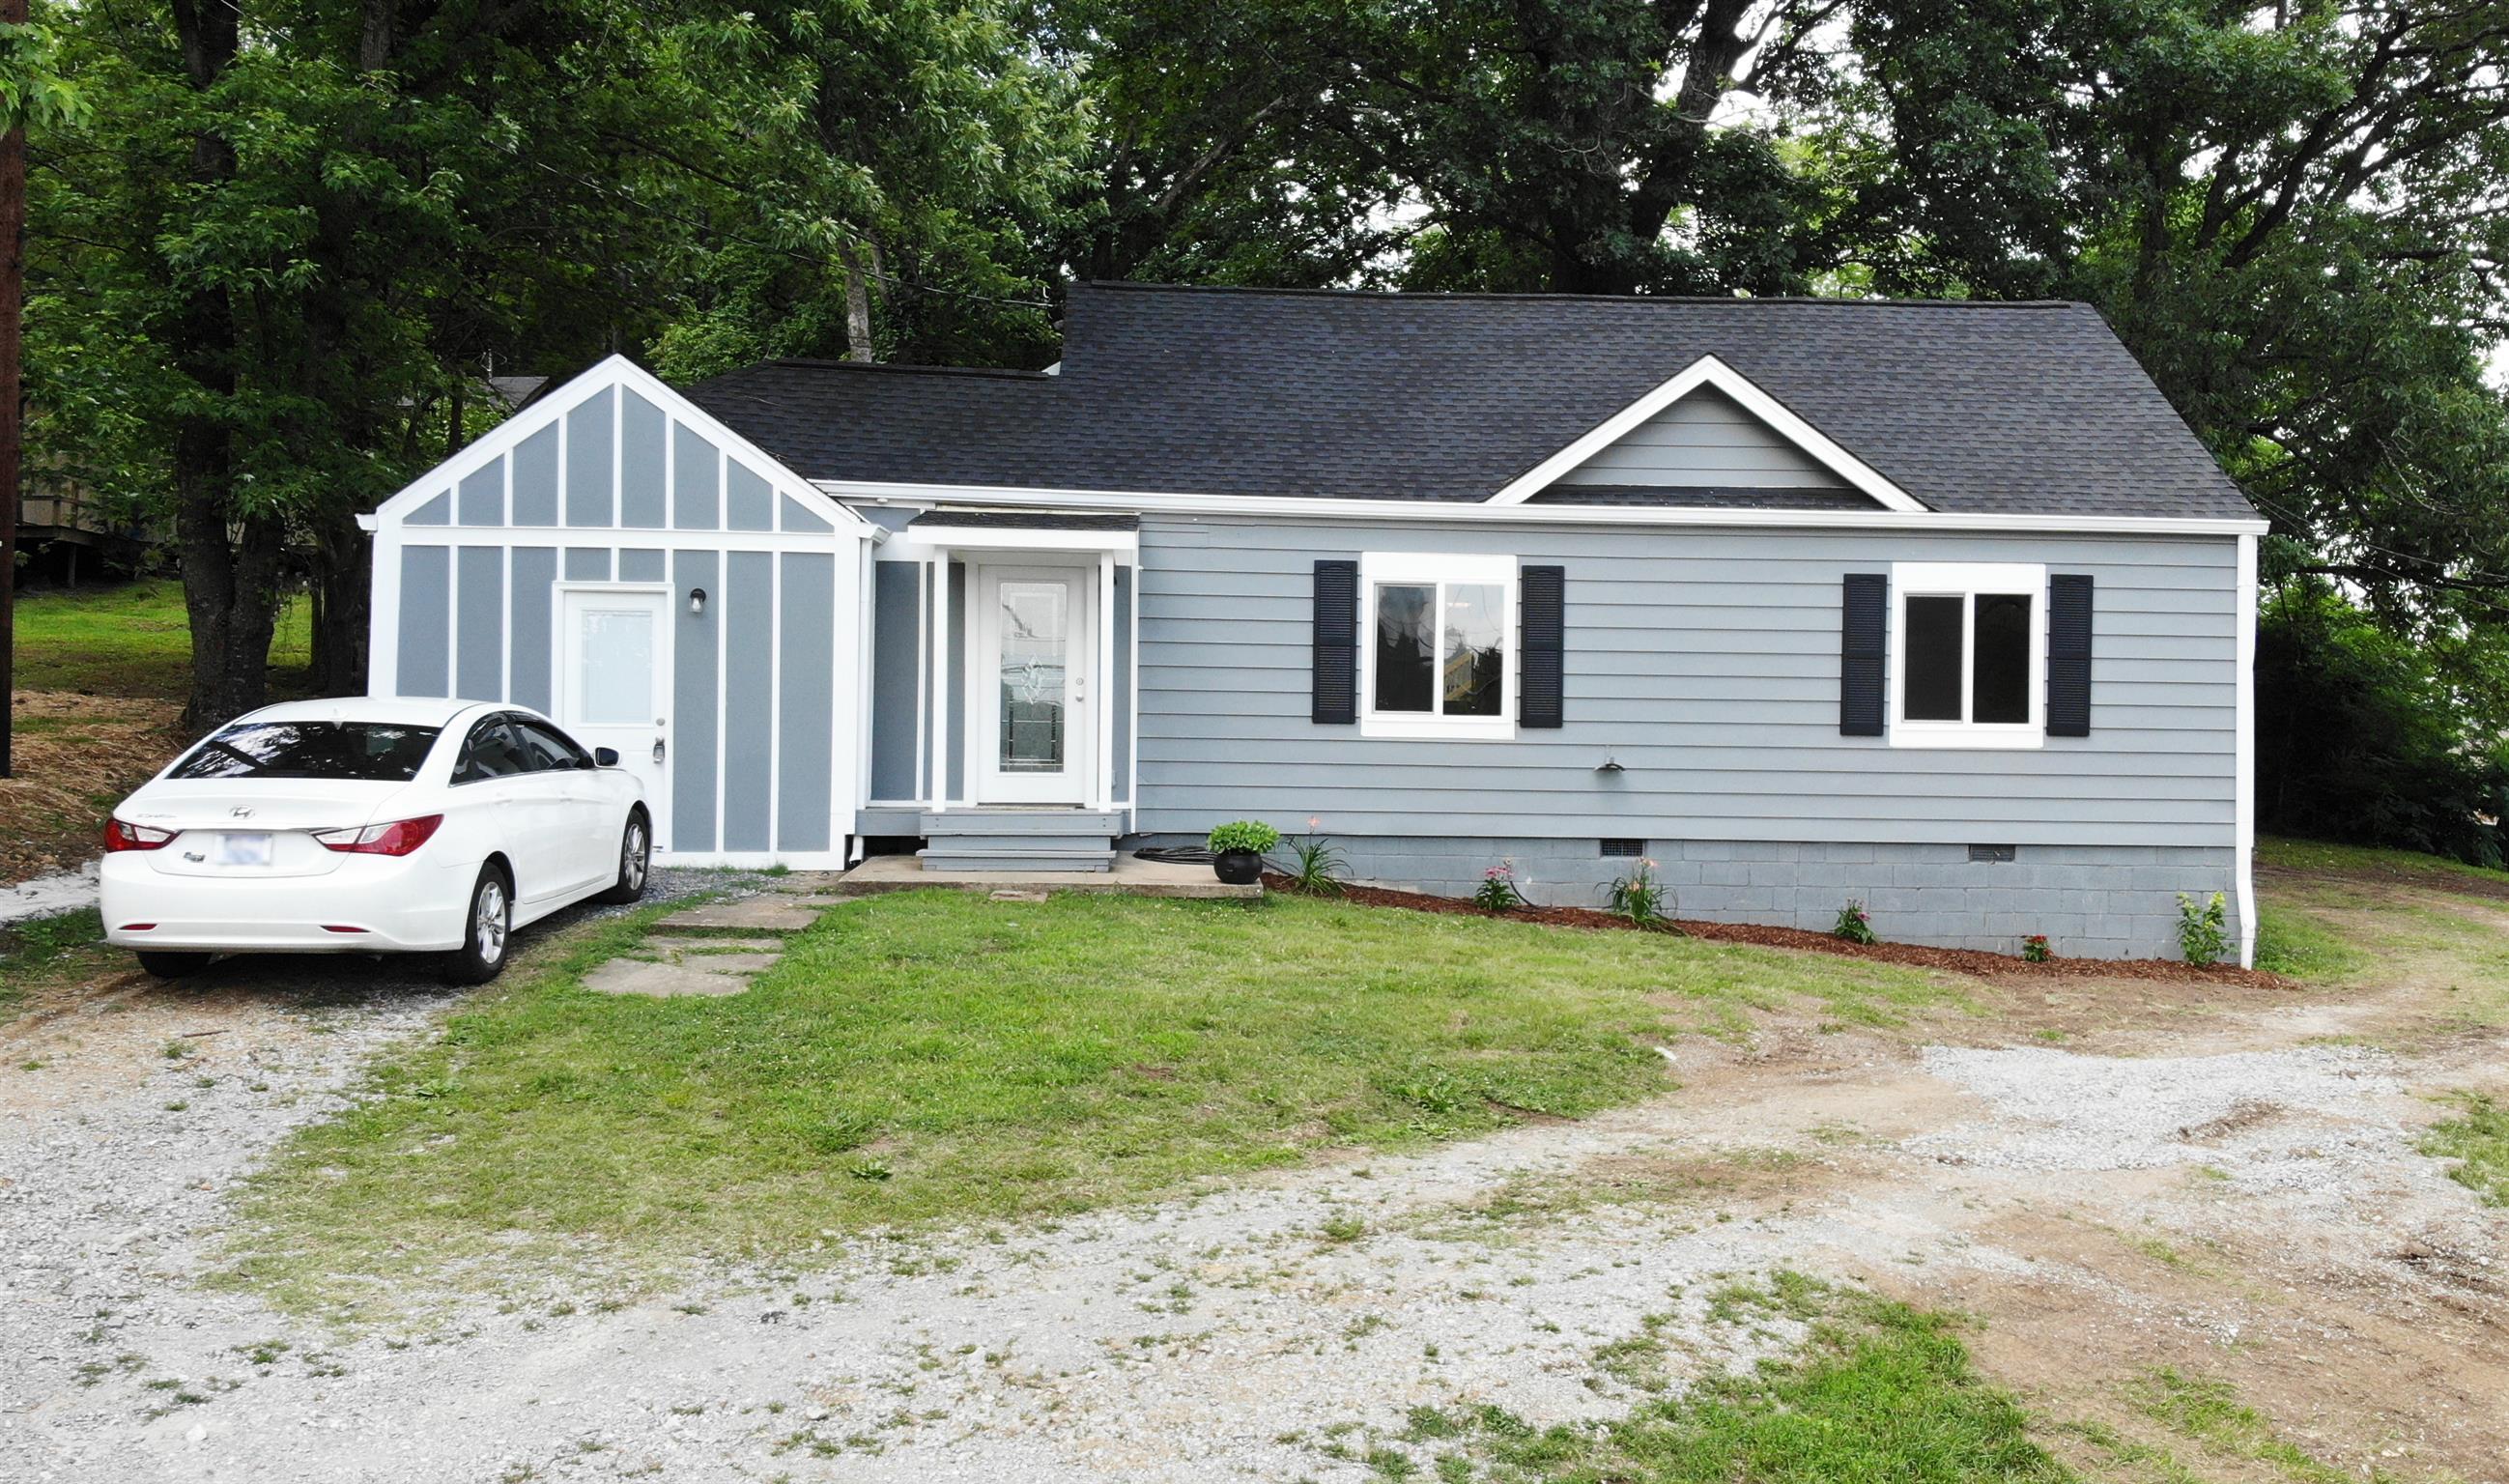 1205 S Dickerson Rd, Goodlettsville, TN 37072 - Goodlettsville, TN real estate listing